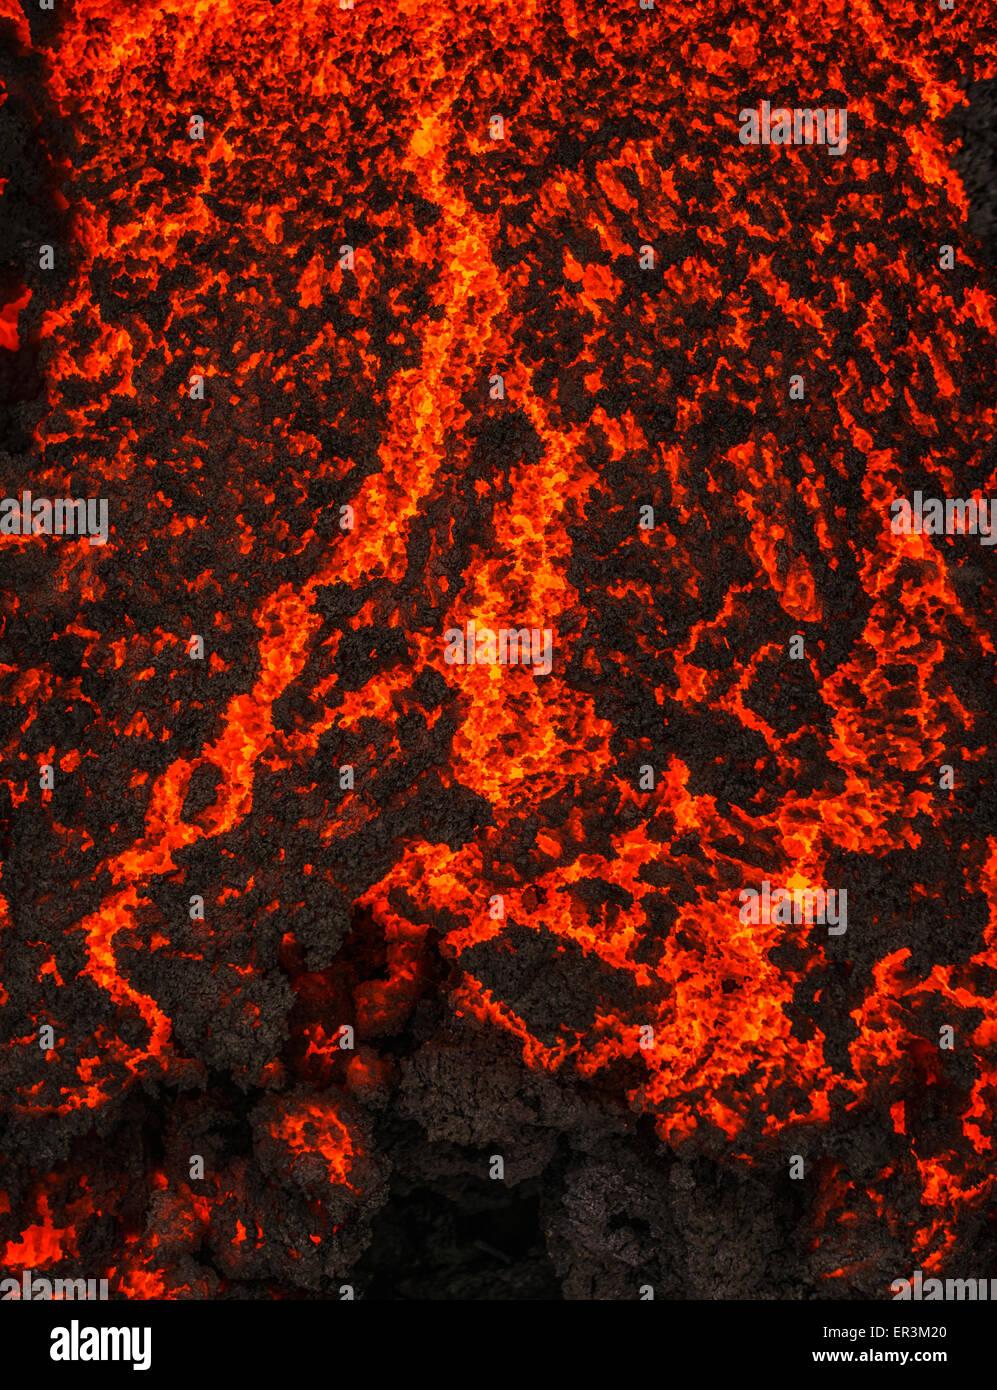 Glowing lava, eruption at the Holuhraun Fissure, Bardarbunga Volcano, Iceland. - Stock Image